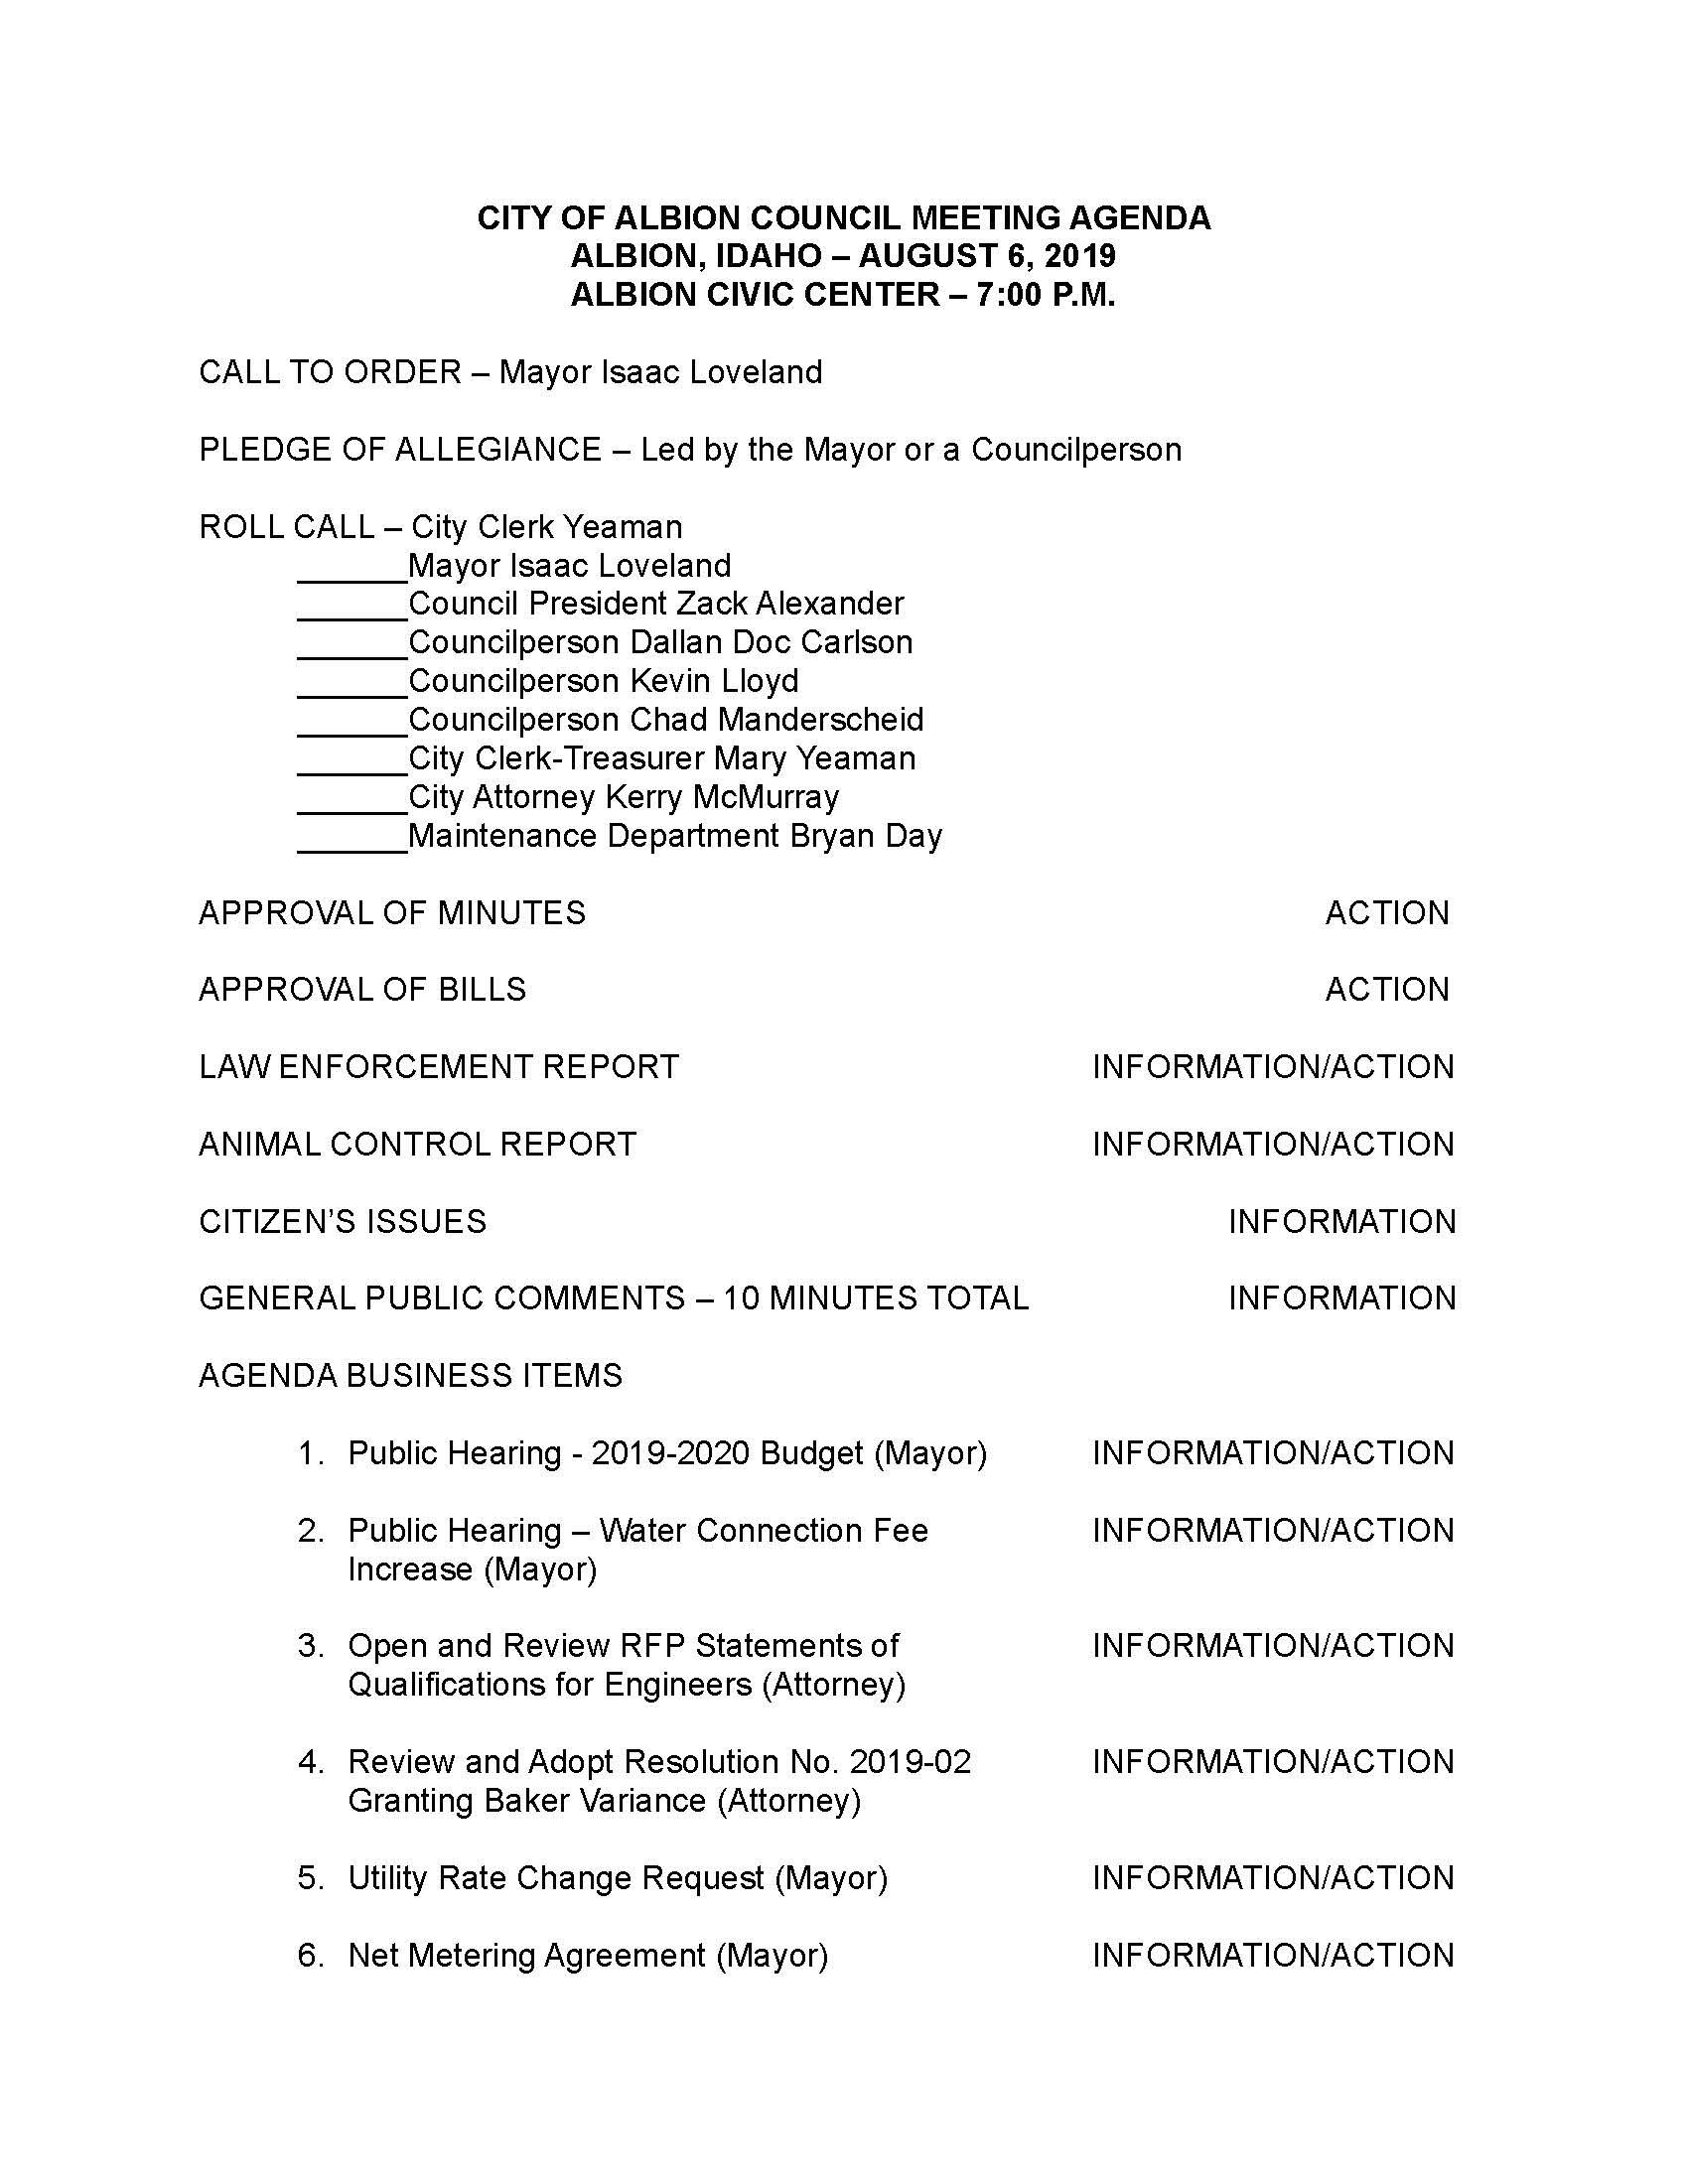 Agenda 08.06_Page_1.jpg